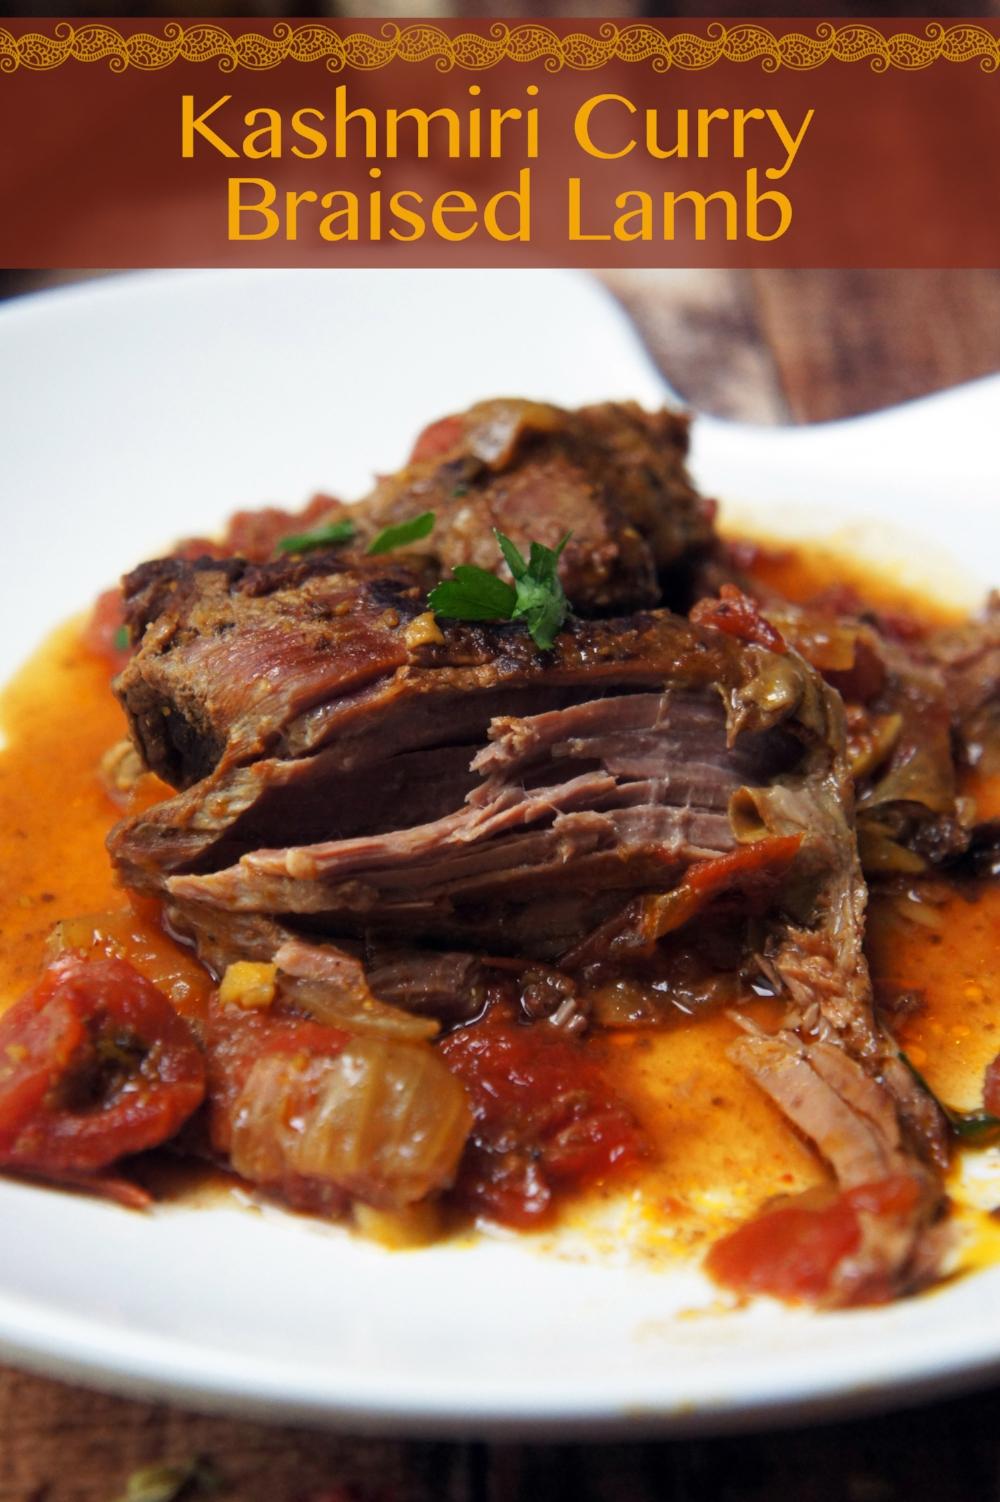 Kashmiri Curry Braised Leg of Lamb